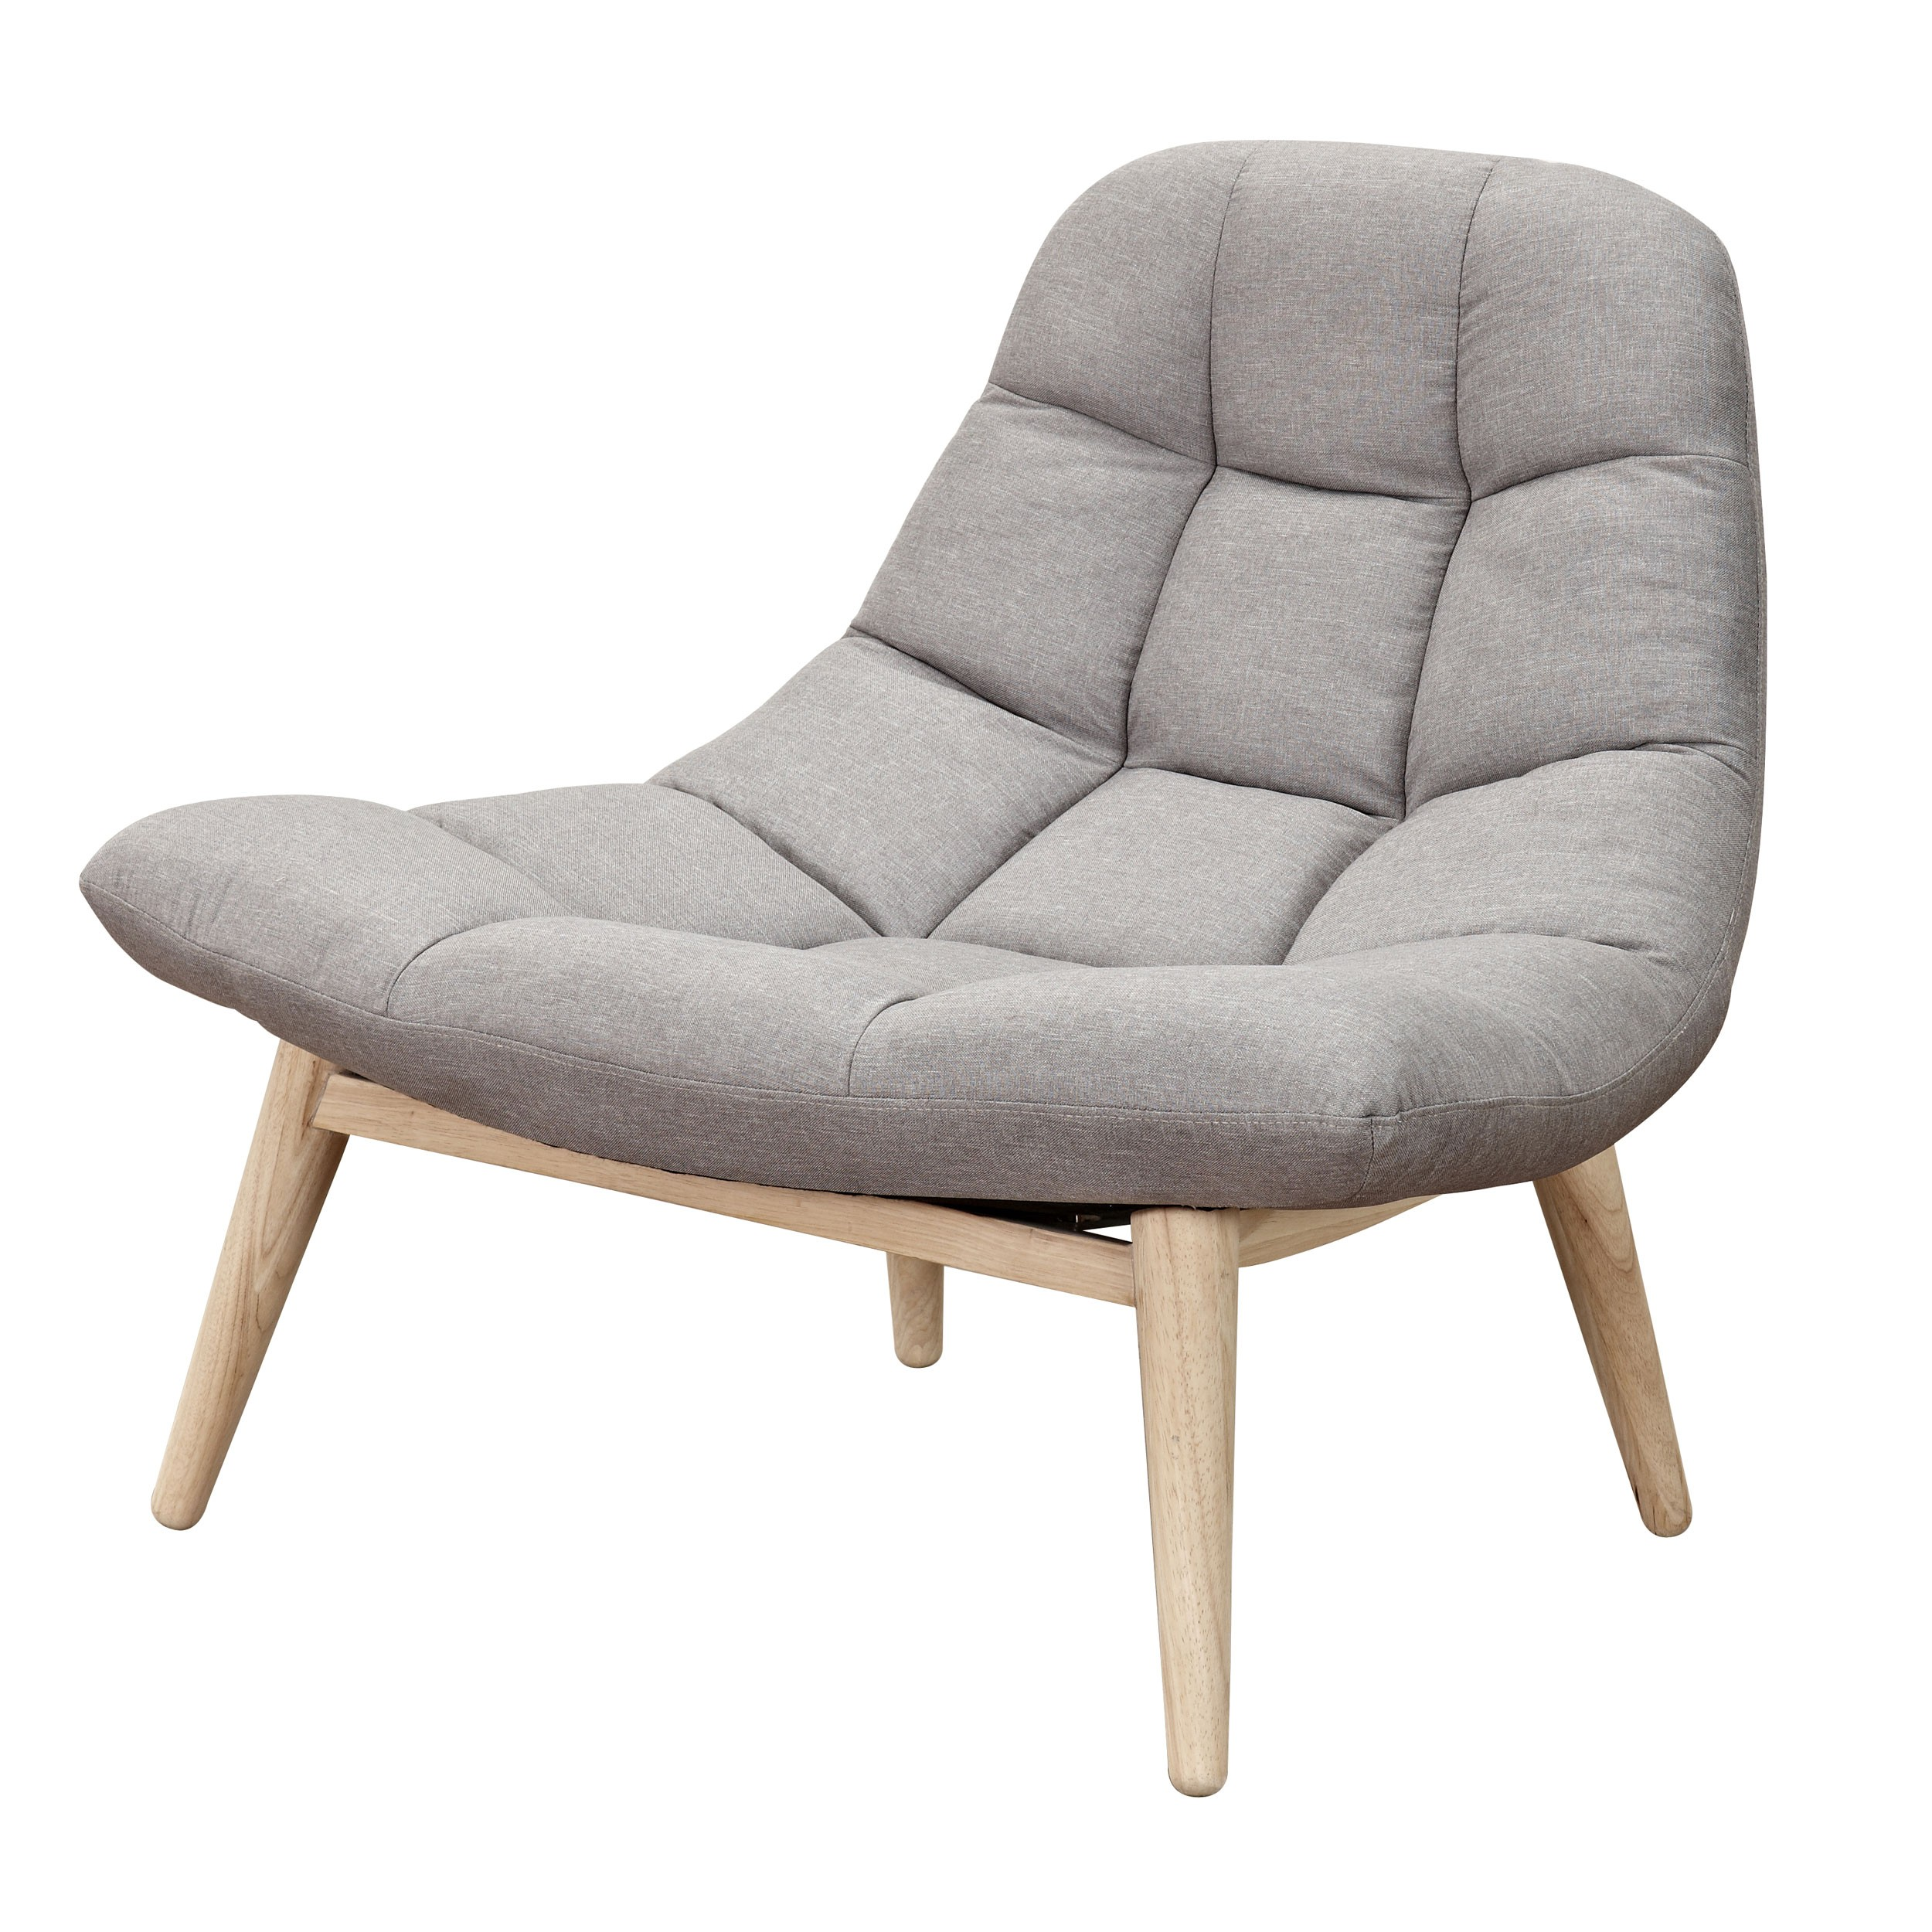 fauteuil melby gris perle adopez nos fauteuils melby. Black Bedroom Furniture Sets. Home Design Ideas